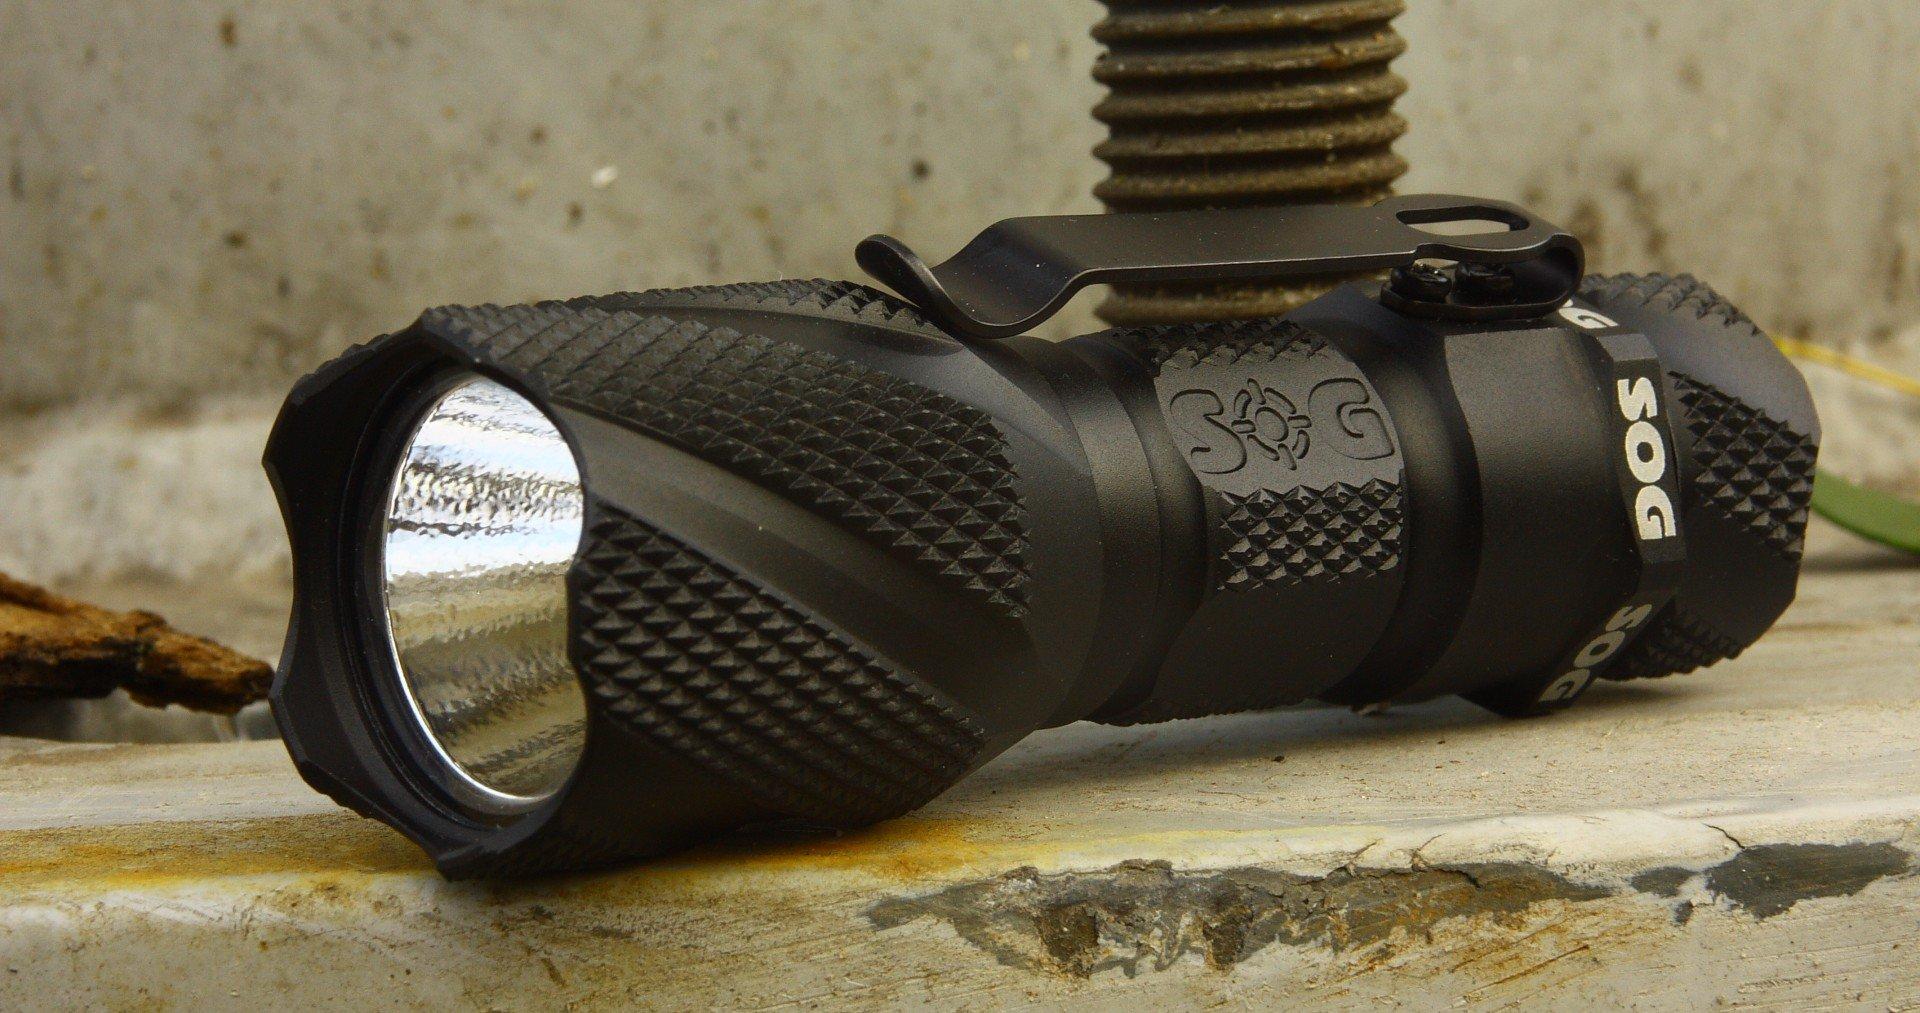 Sog Dark Energy DE 01 – edc flashlight